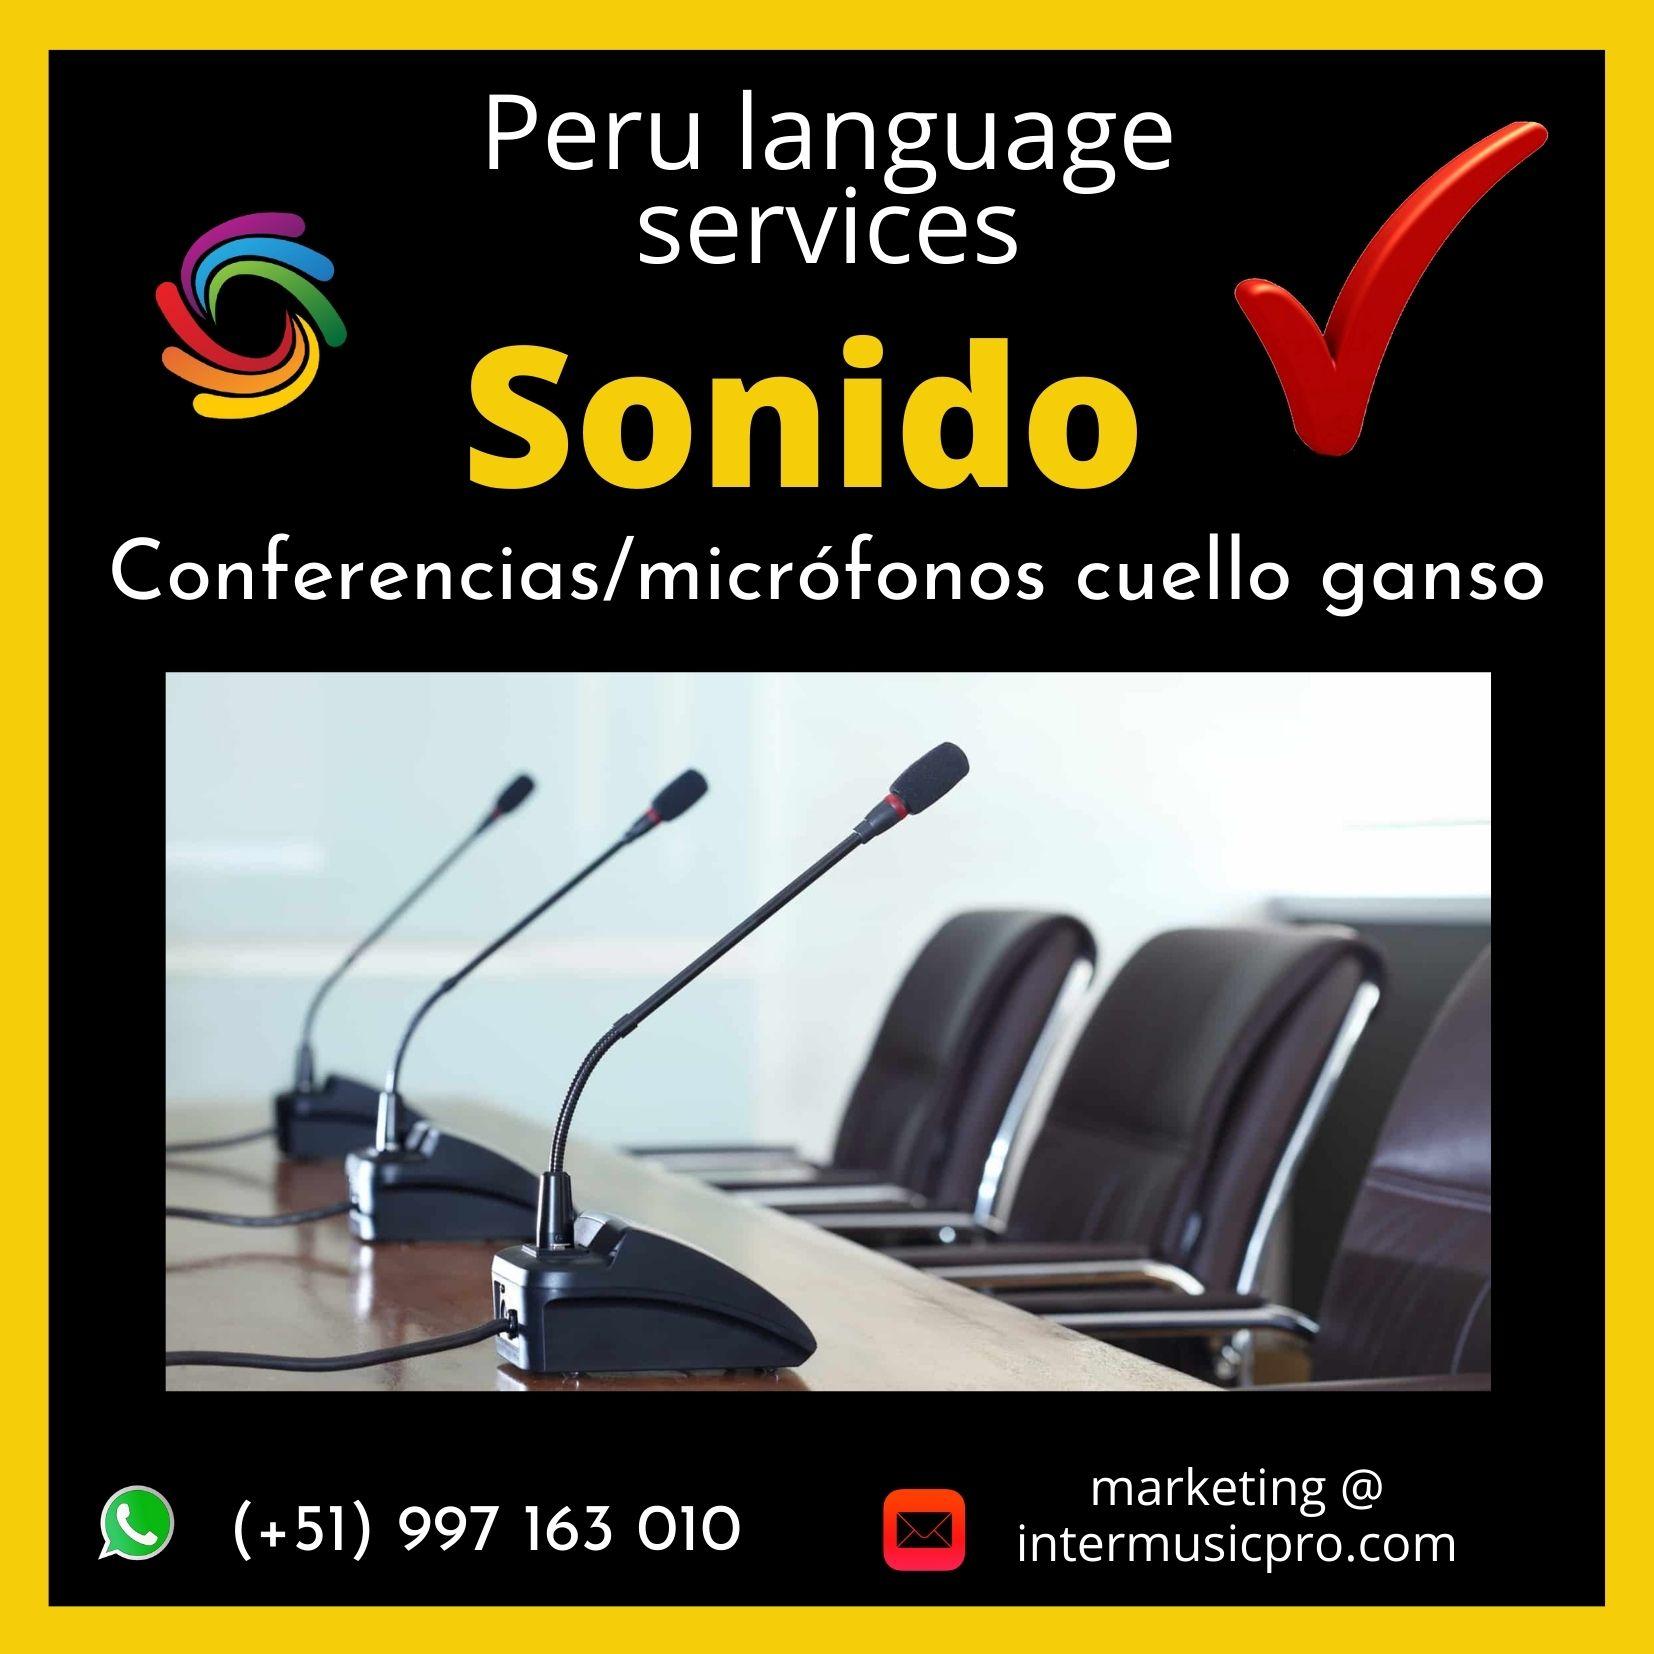 Micrófonos debate / cuello ganso LIMA ✅ 997163010